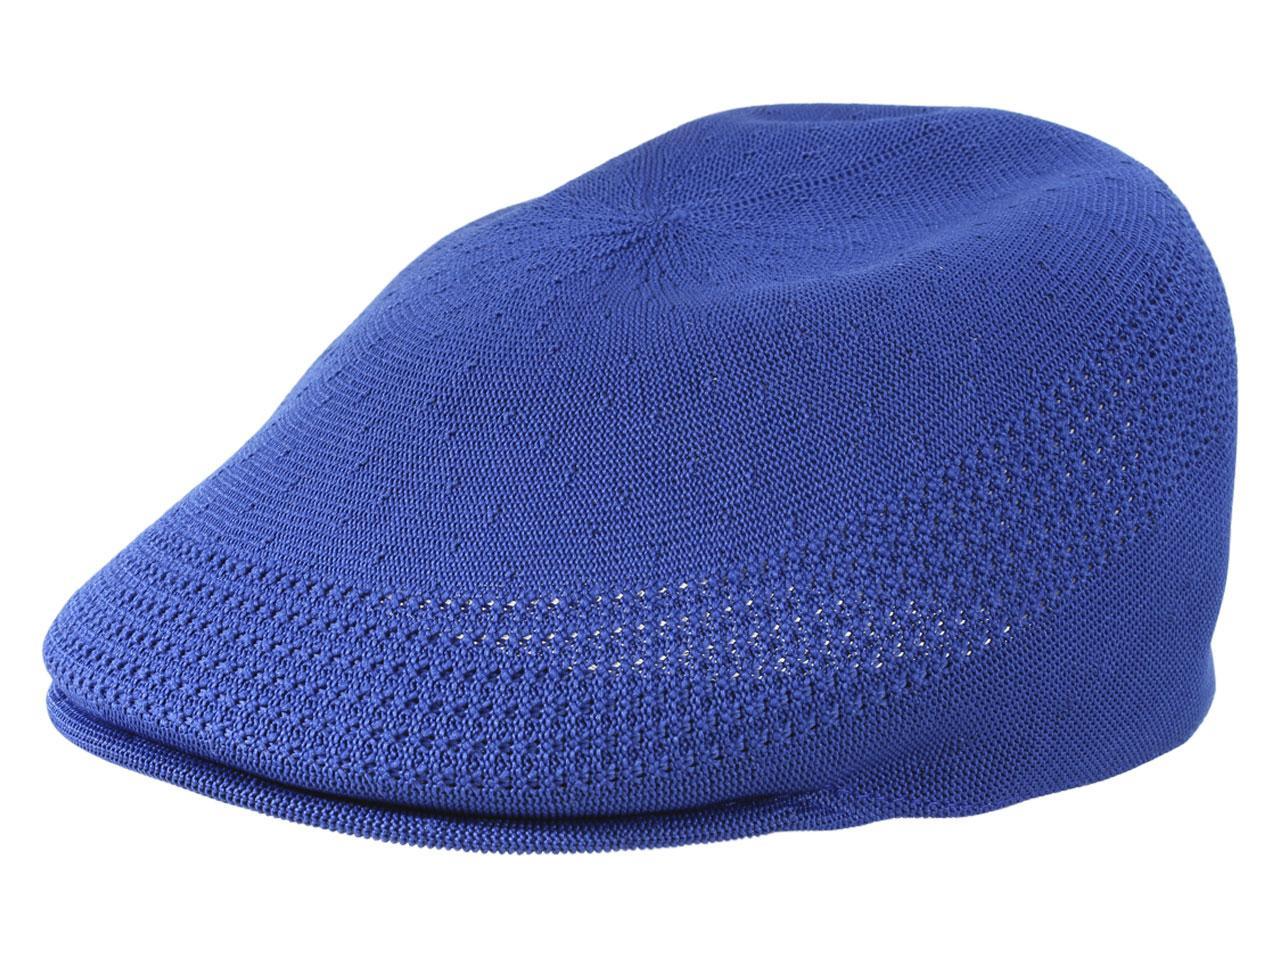 8286251a2c46ad Kangol Men's Tropic 507 Ventair Flat Cap Hat